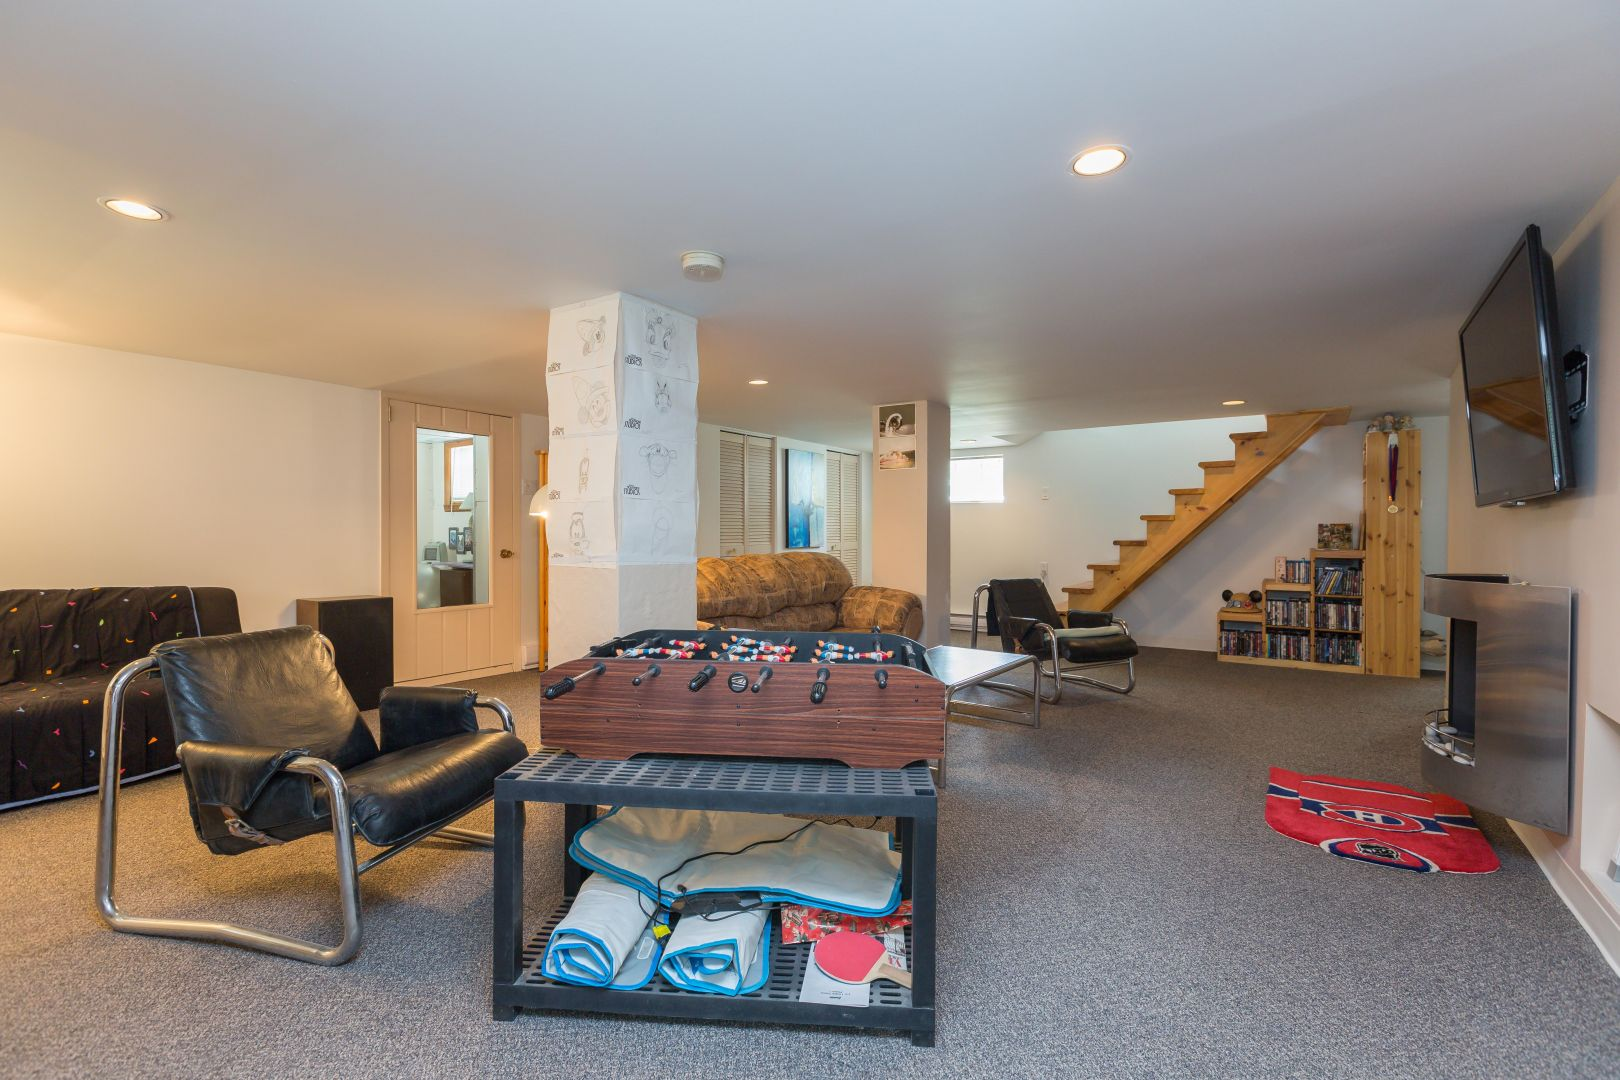 jeux pour creer sa maison interesting de superbe creer sa maison en ligne cuisine chene massif. Black Bedroom Furniture Sets. Home Design Ideas